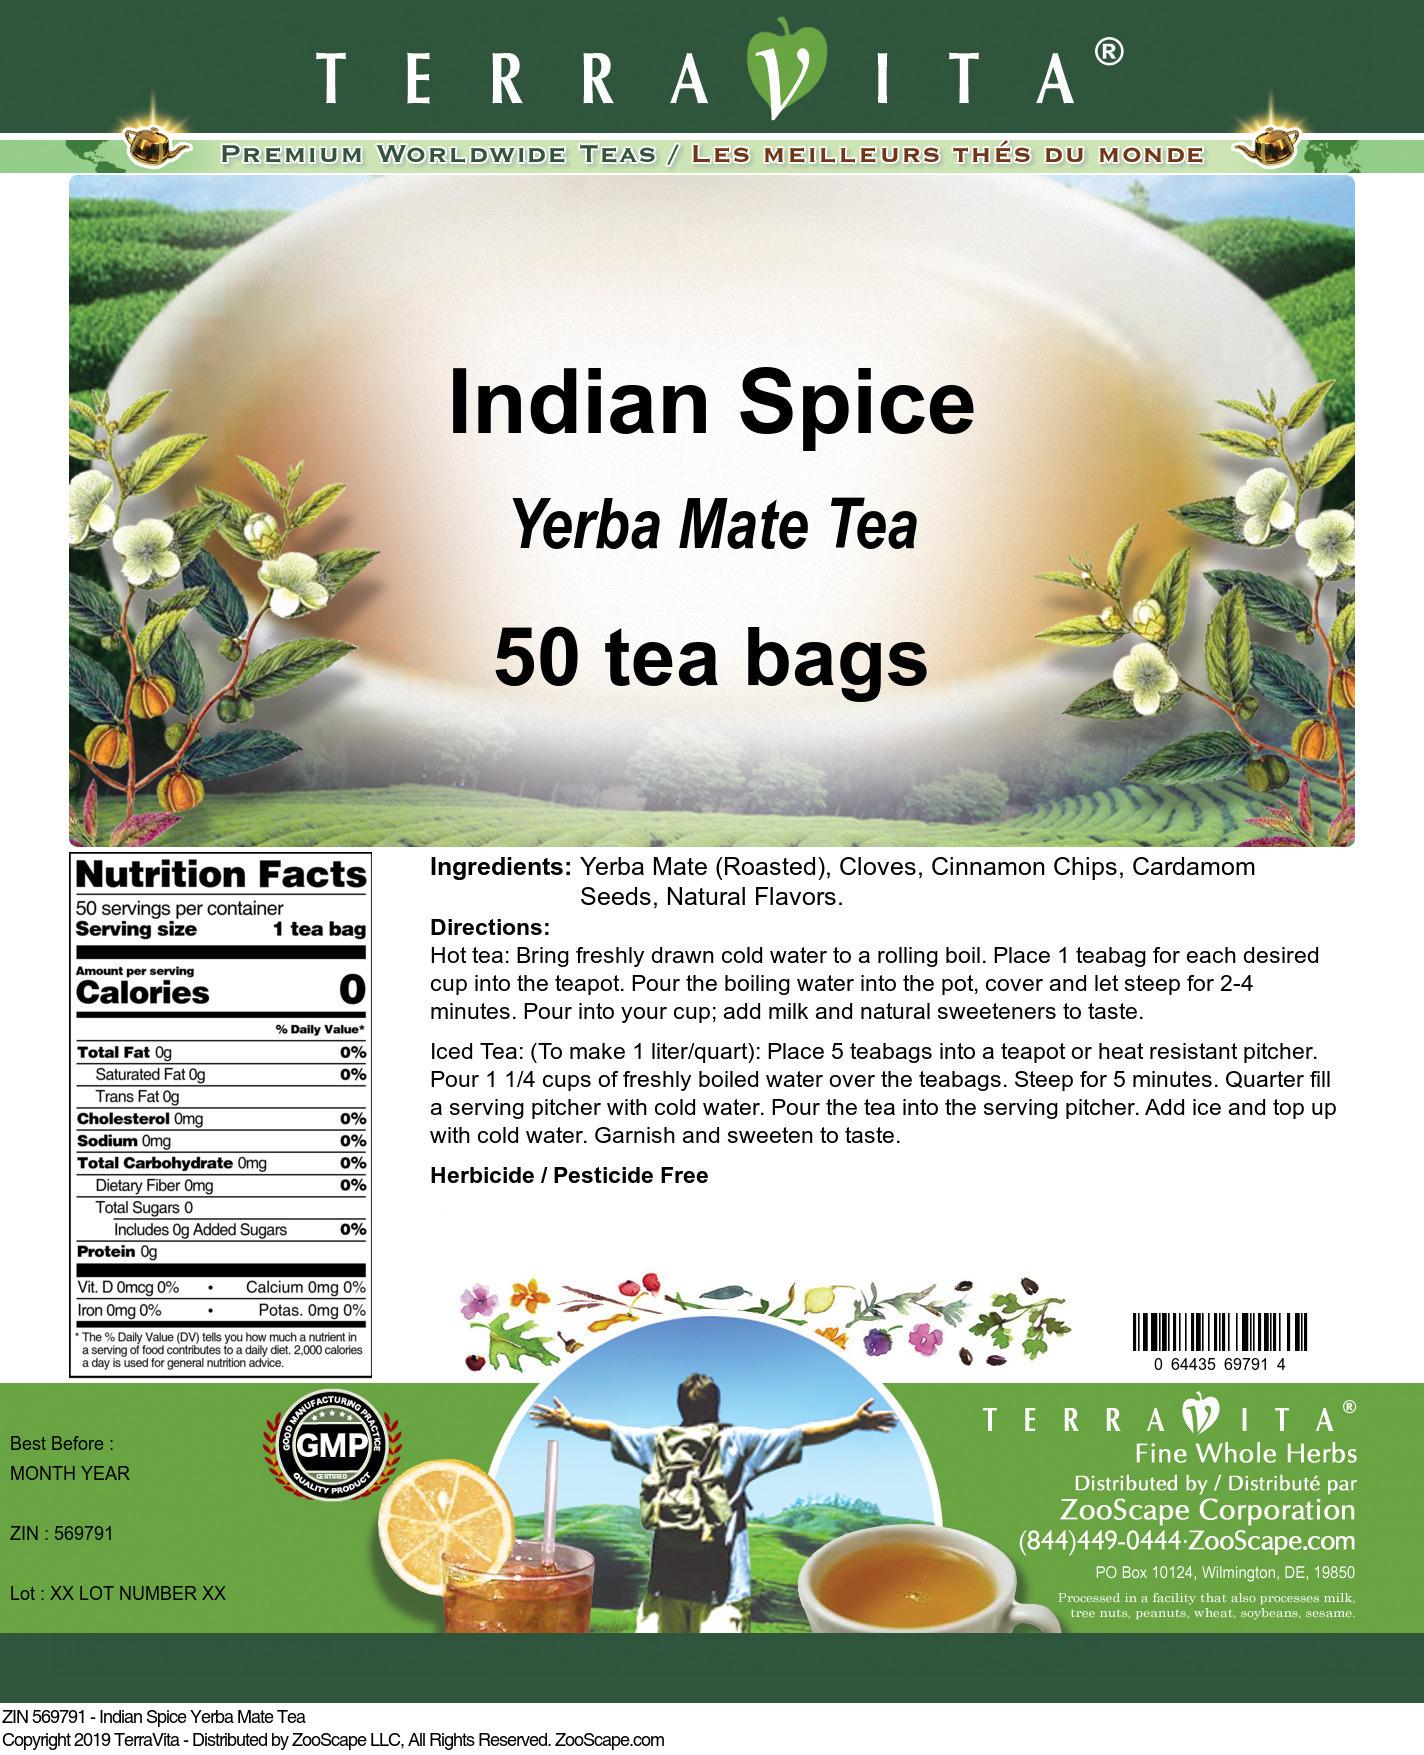 Indian Spice Yerba Mate